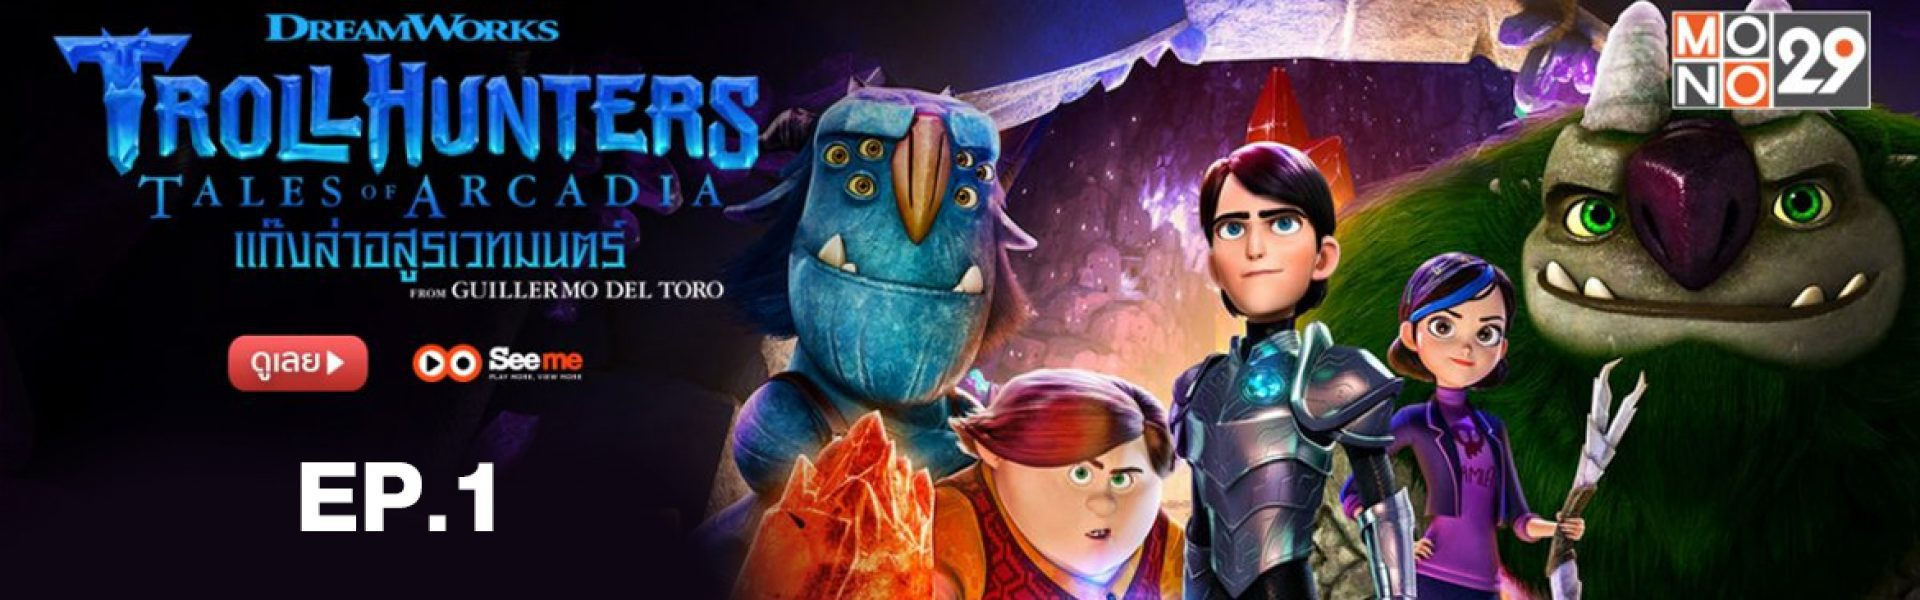 Trollhunters: Tales of Arcadia แก๊งล่าอสูรเวทมนตร์ ปี 1 EP.1 [1/2]